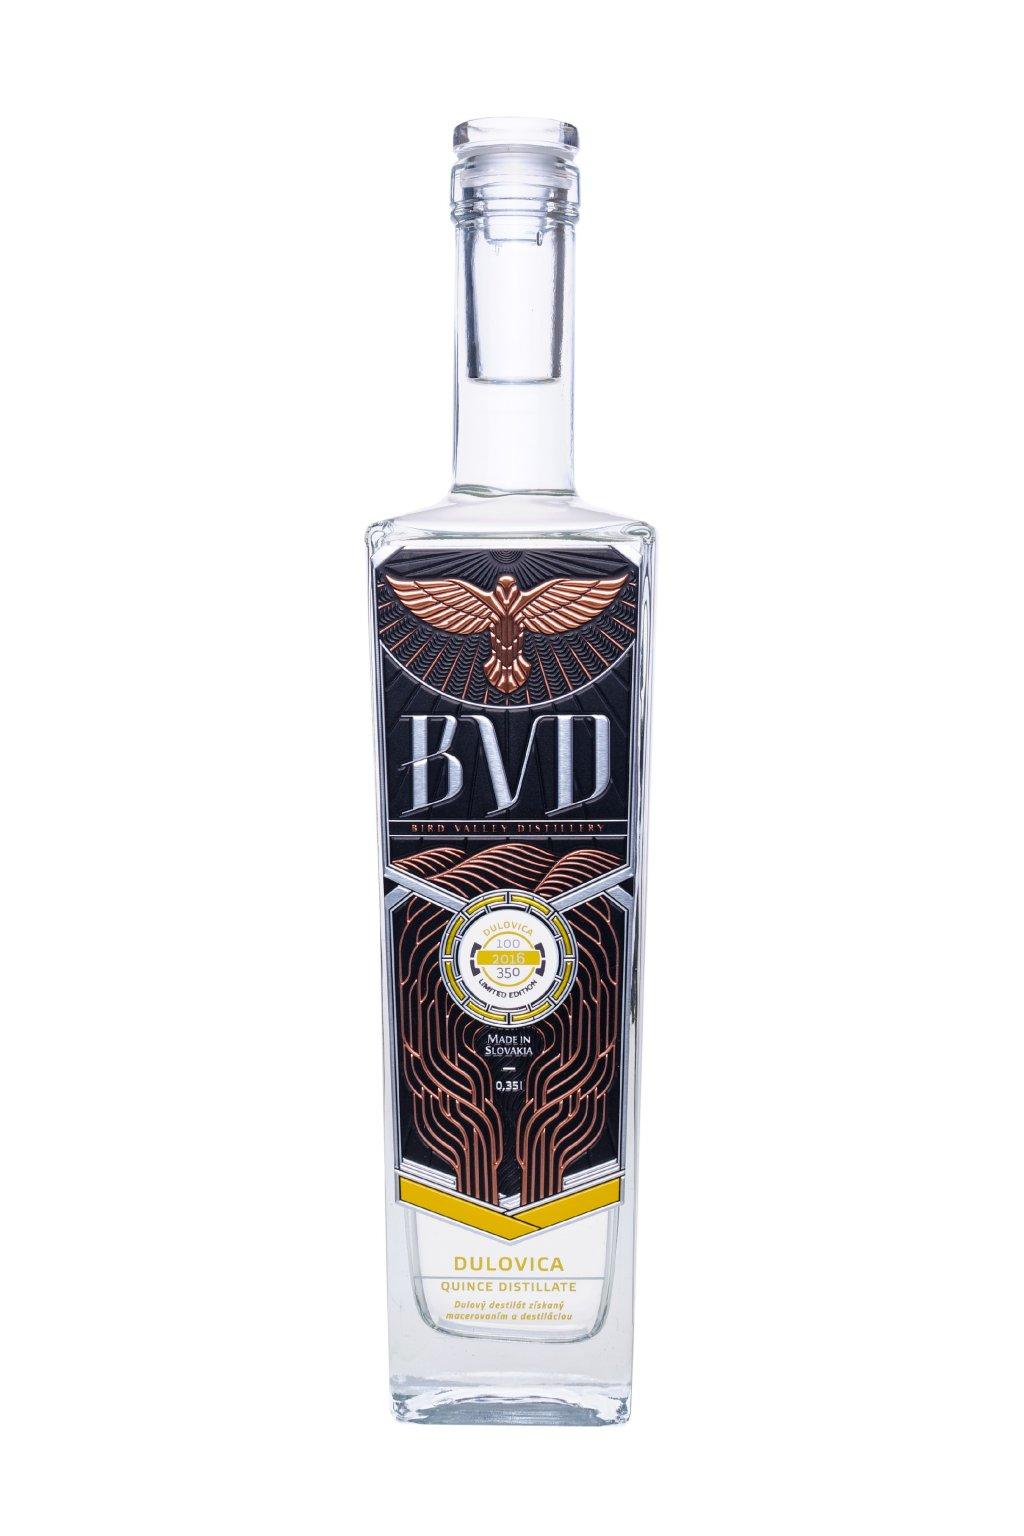 BVD Dulovica destilat 0,35l